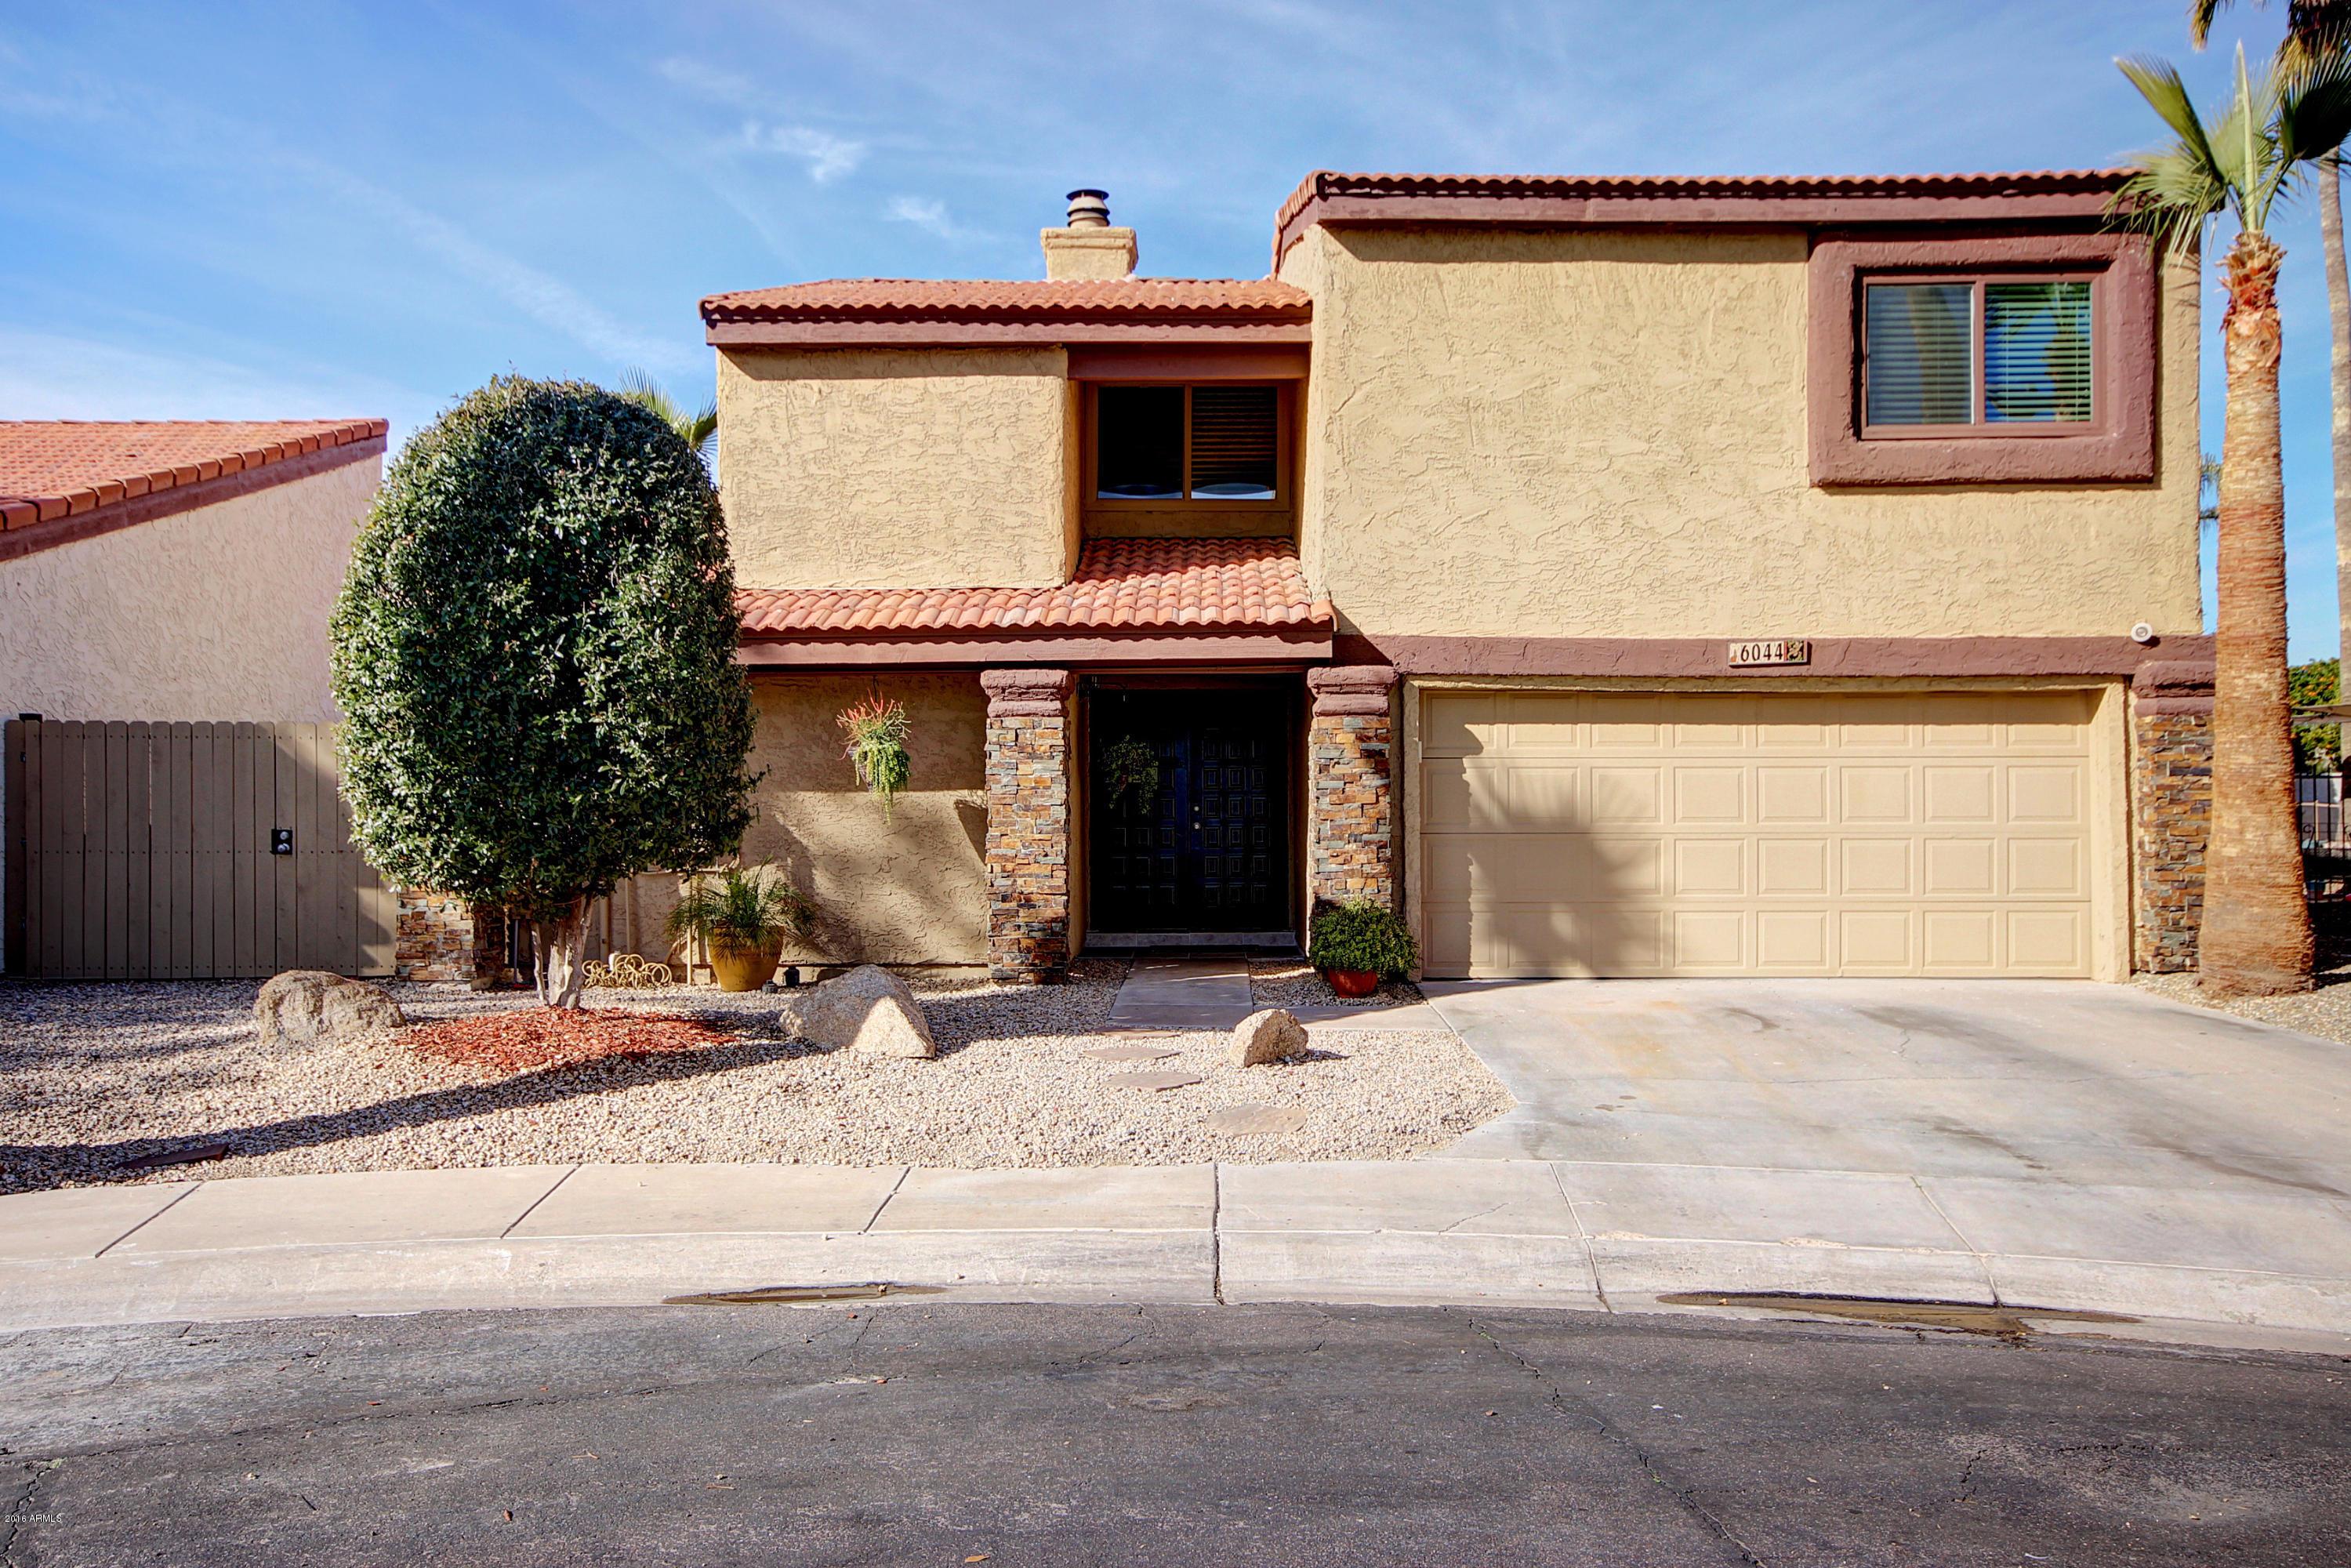 6044 N 81st Place  Scottsdale 85250